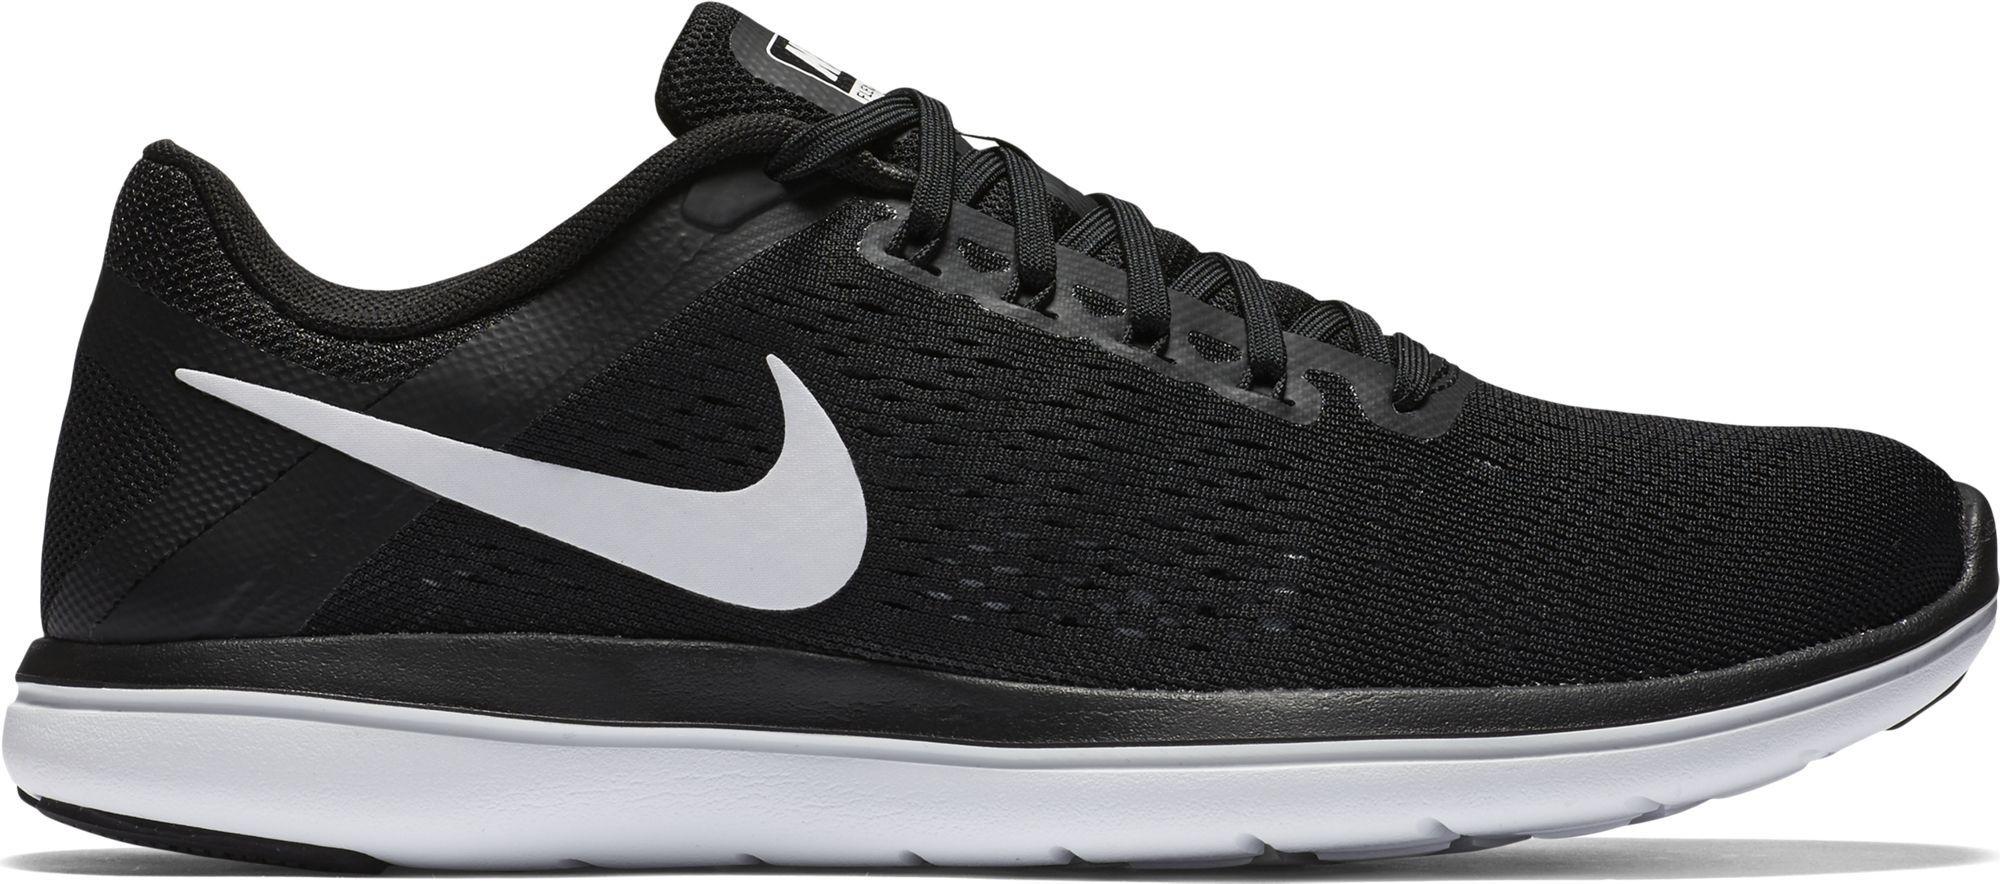 Buty Wmns Nike Flex 2016 Rn 830751 001 Nike Internetowy Sklep Sportowy Martes Sport Nike Women Running Shoes Nike